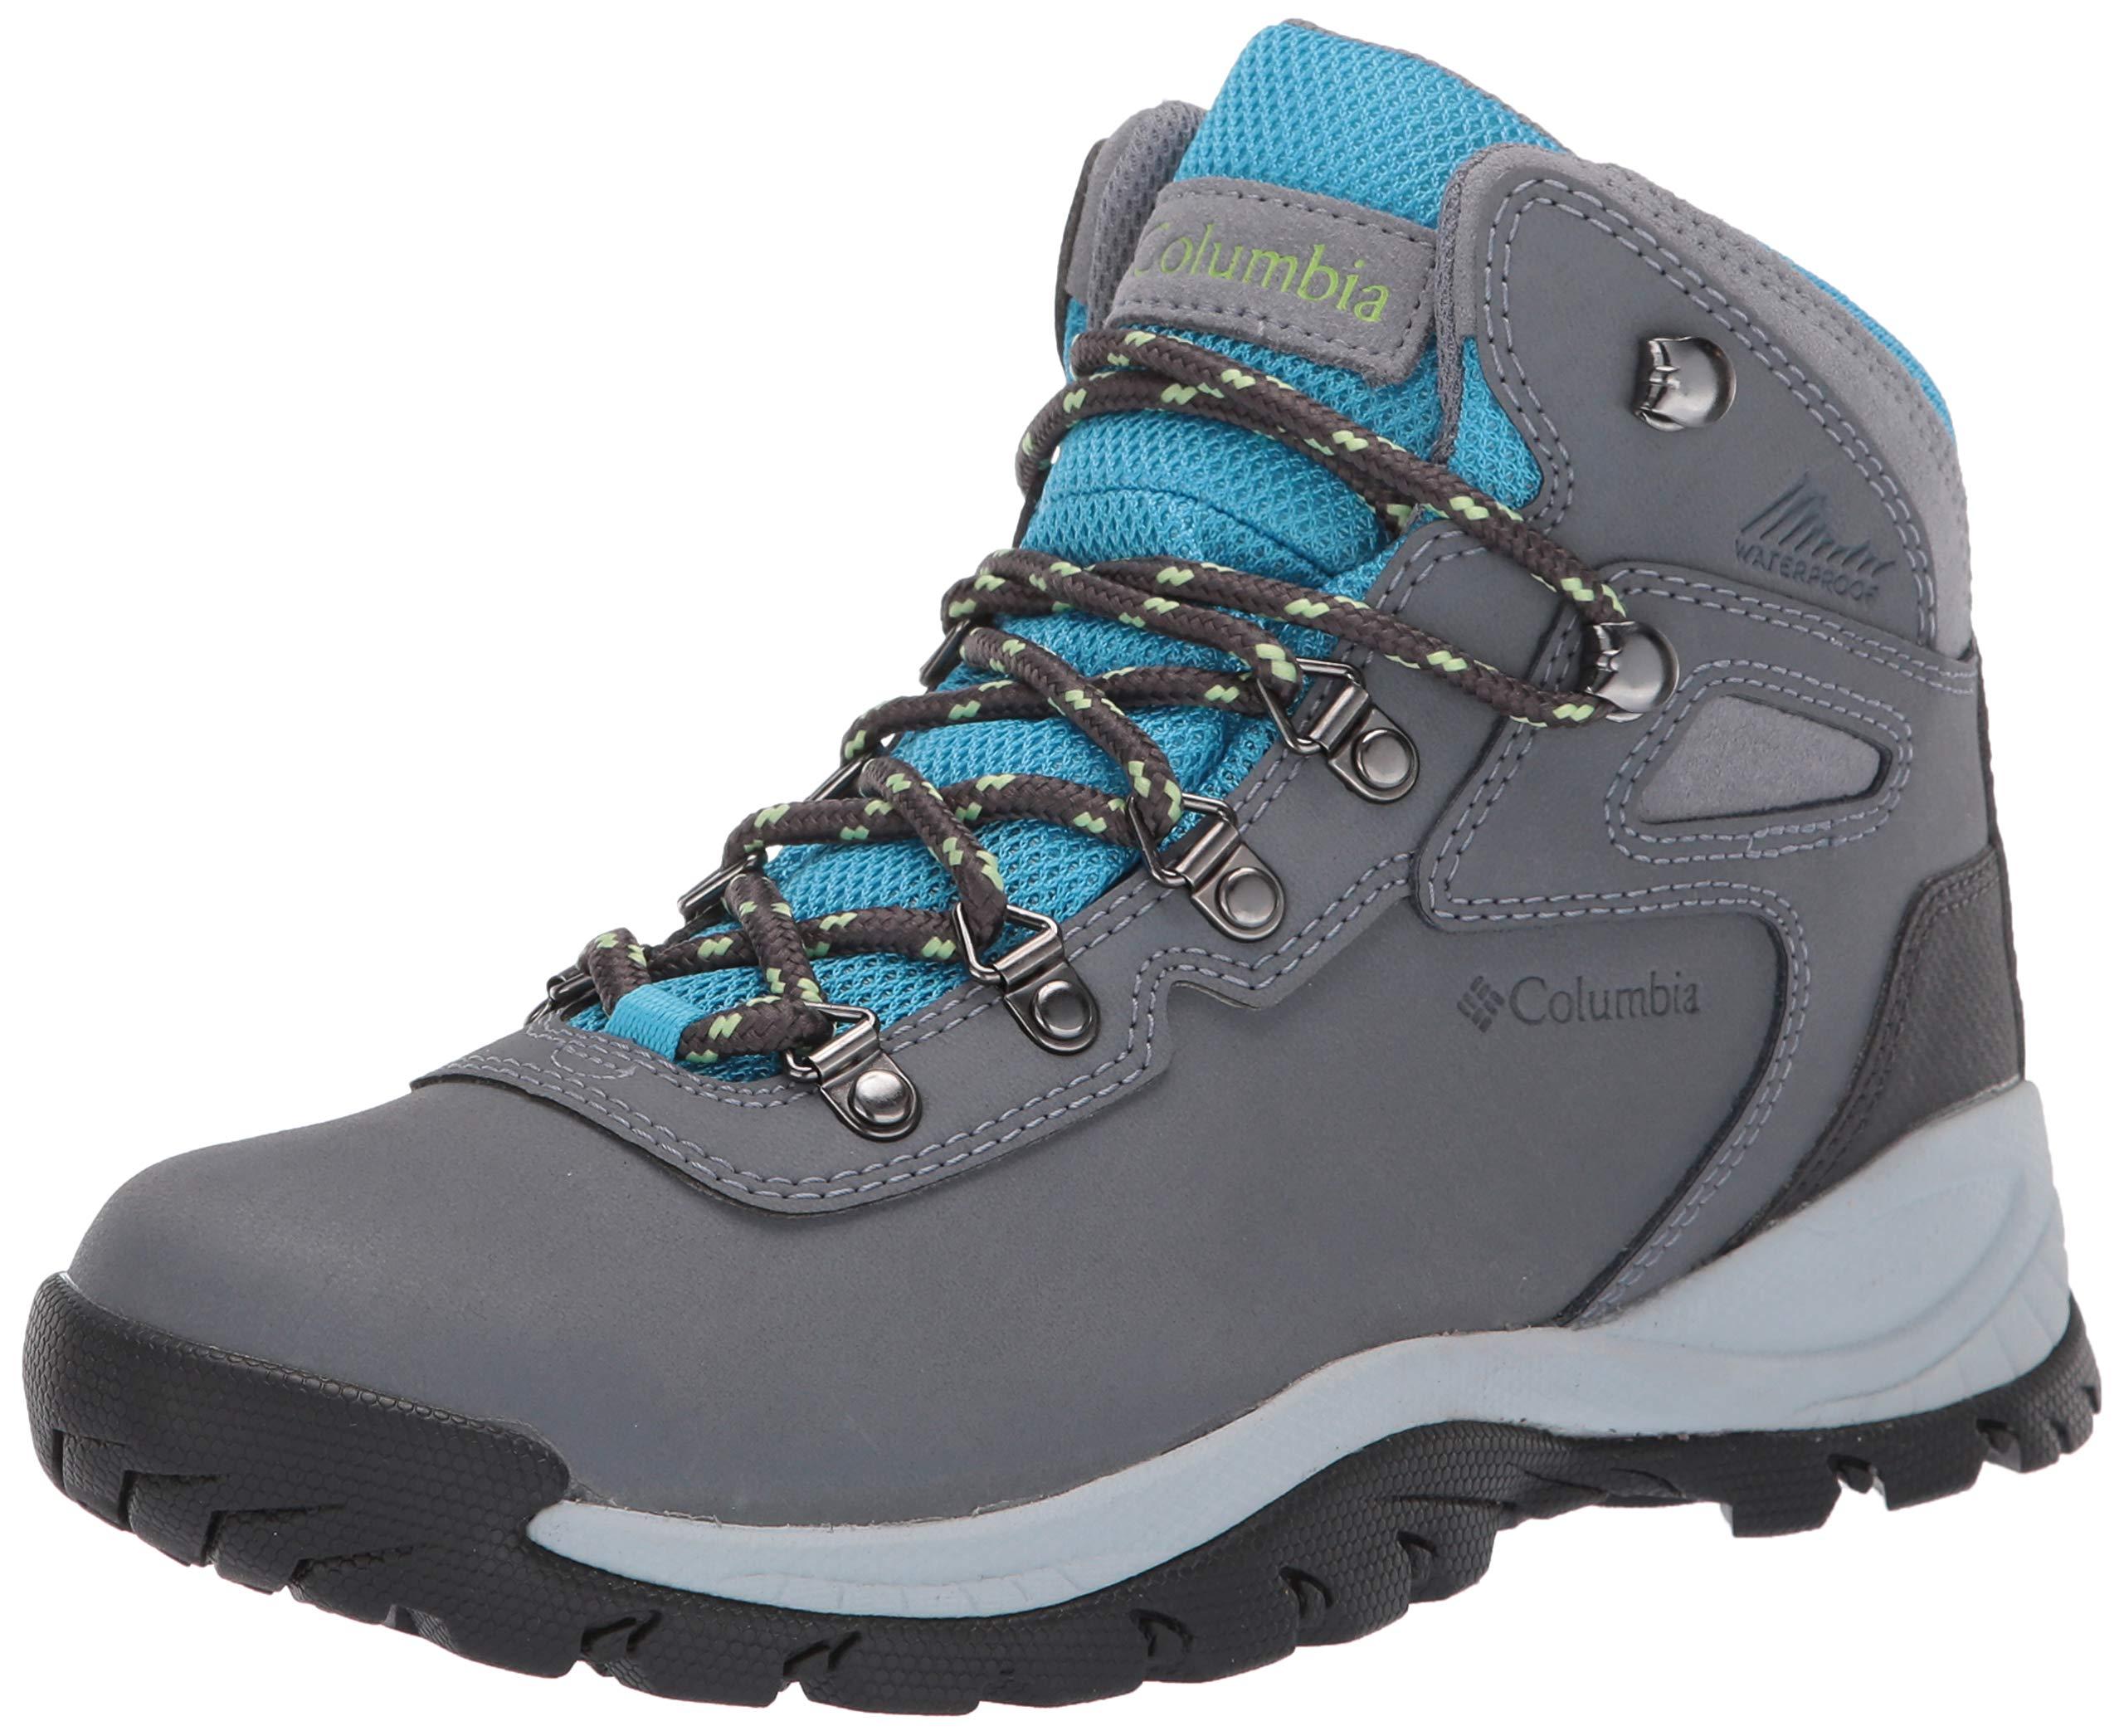 Columbia Women's Newton Ridge Plus Hiking Boot, Grey Ash/Riptide, 6 Regular US by Columbia (Image #1)